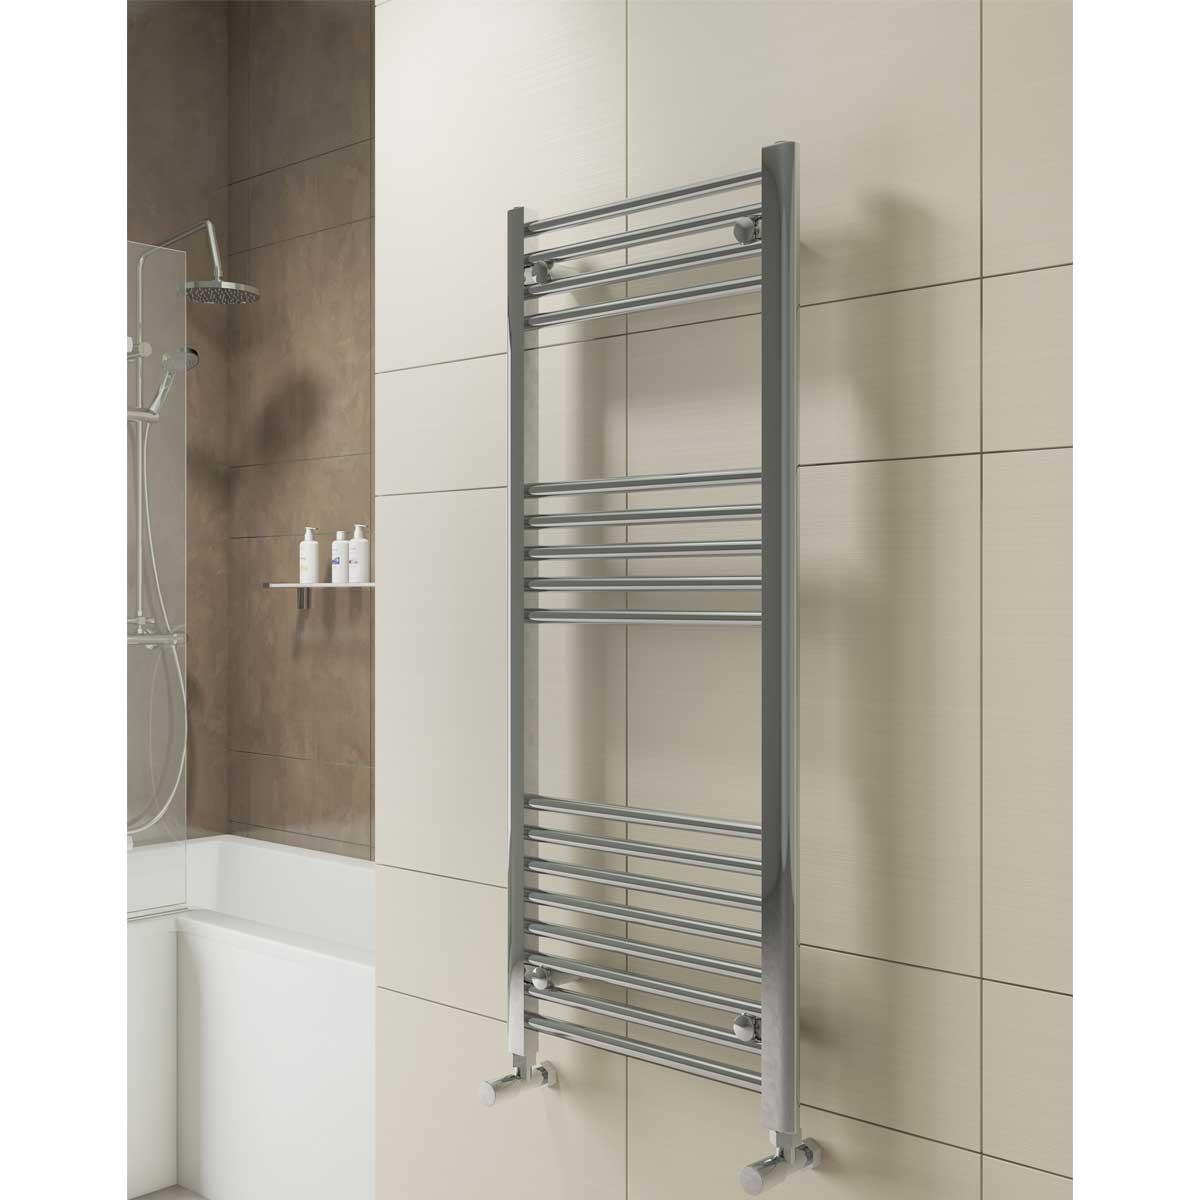 Cali York Flat Heated Towel Rail 1600mm H x 500mm W Chrome